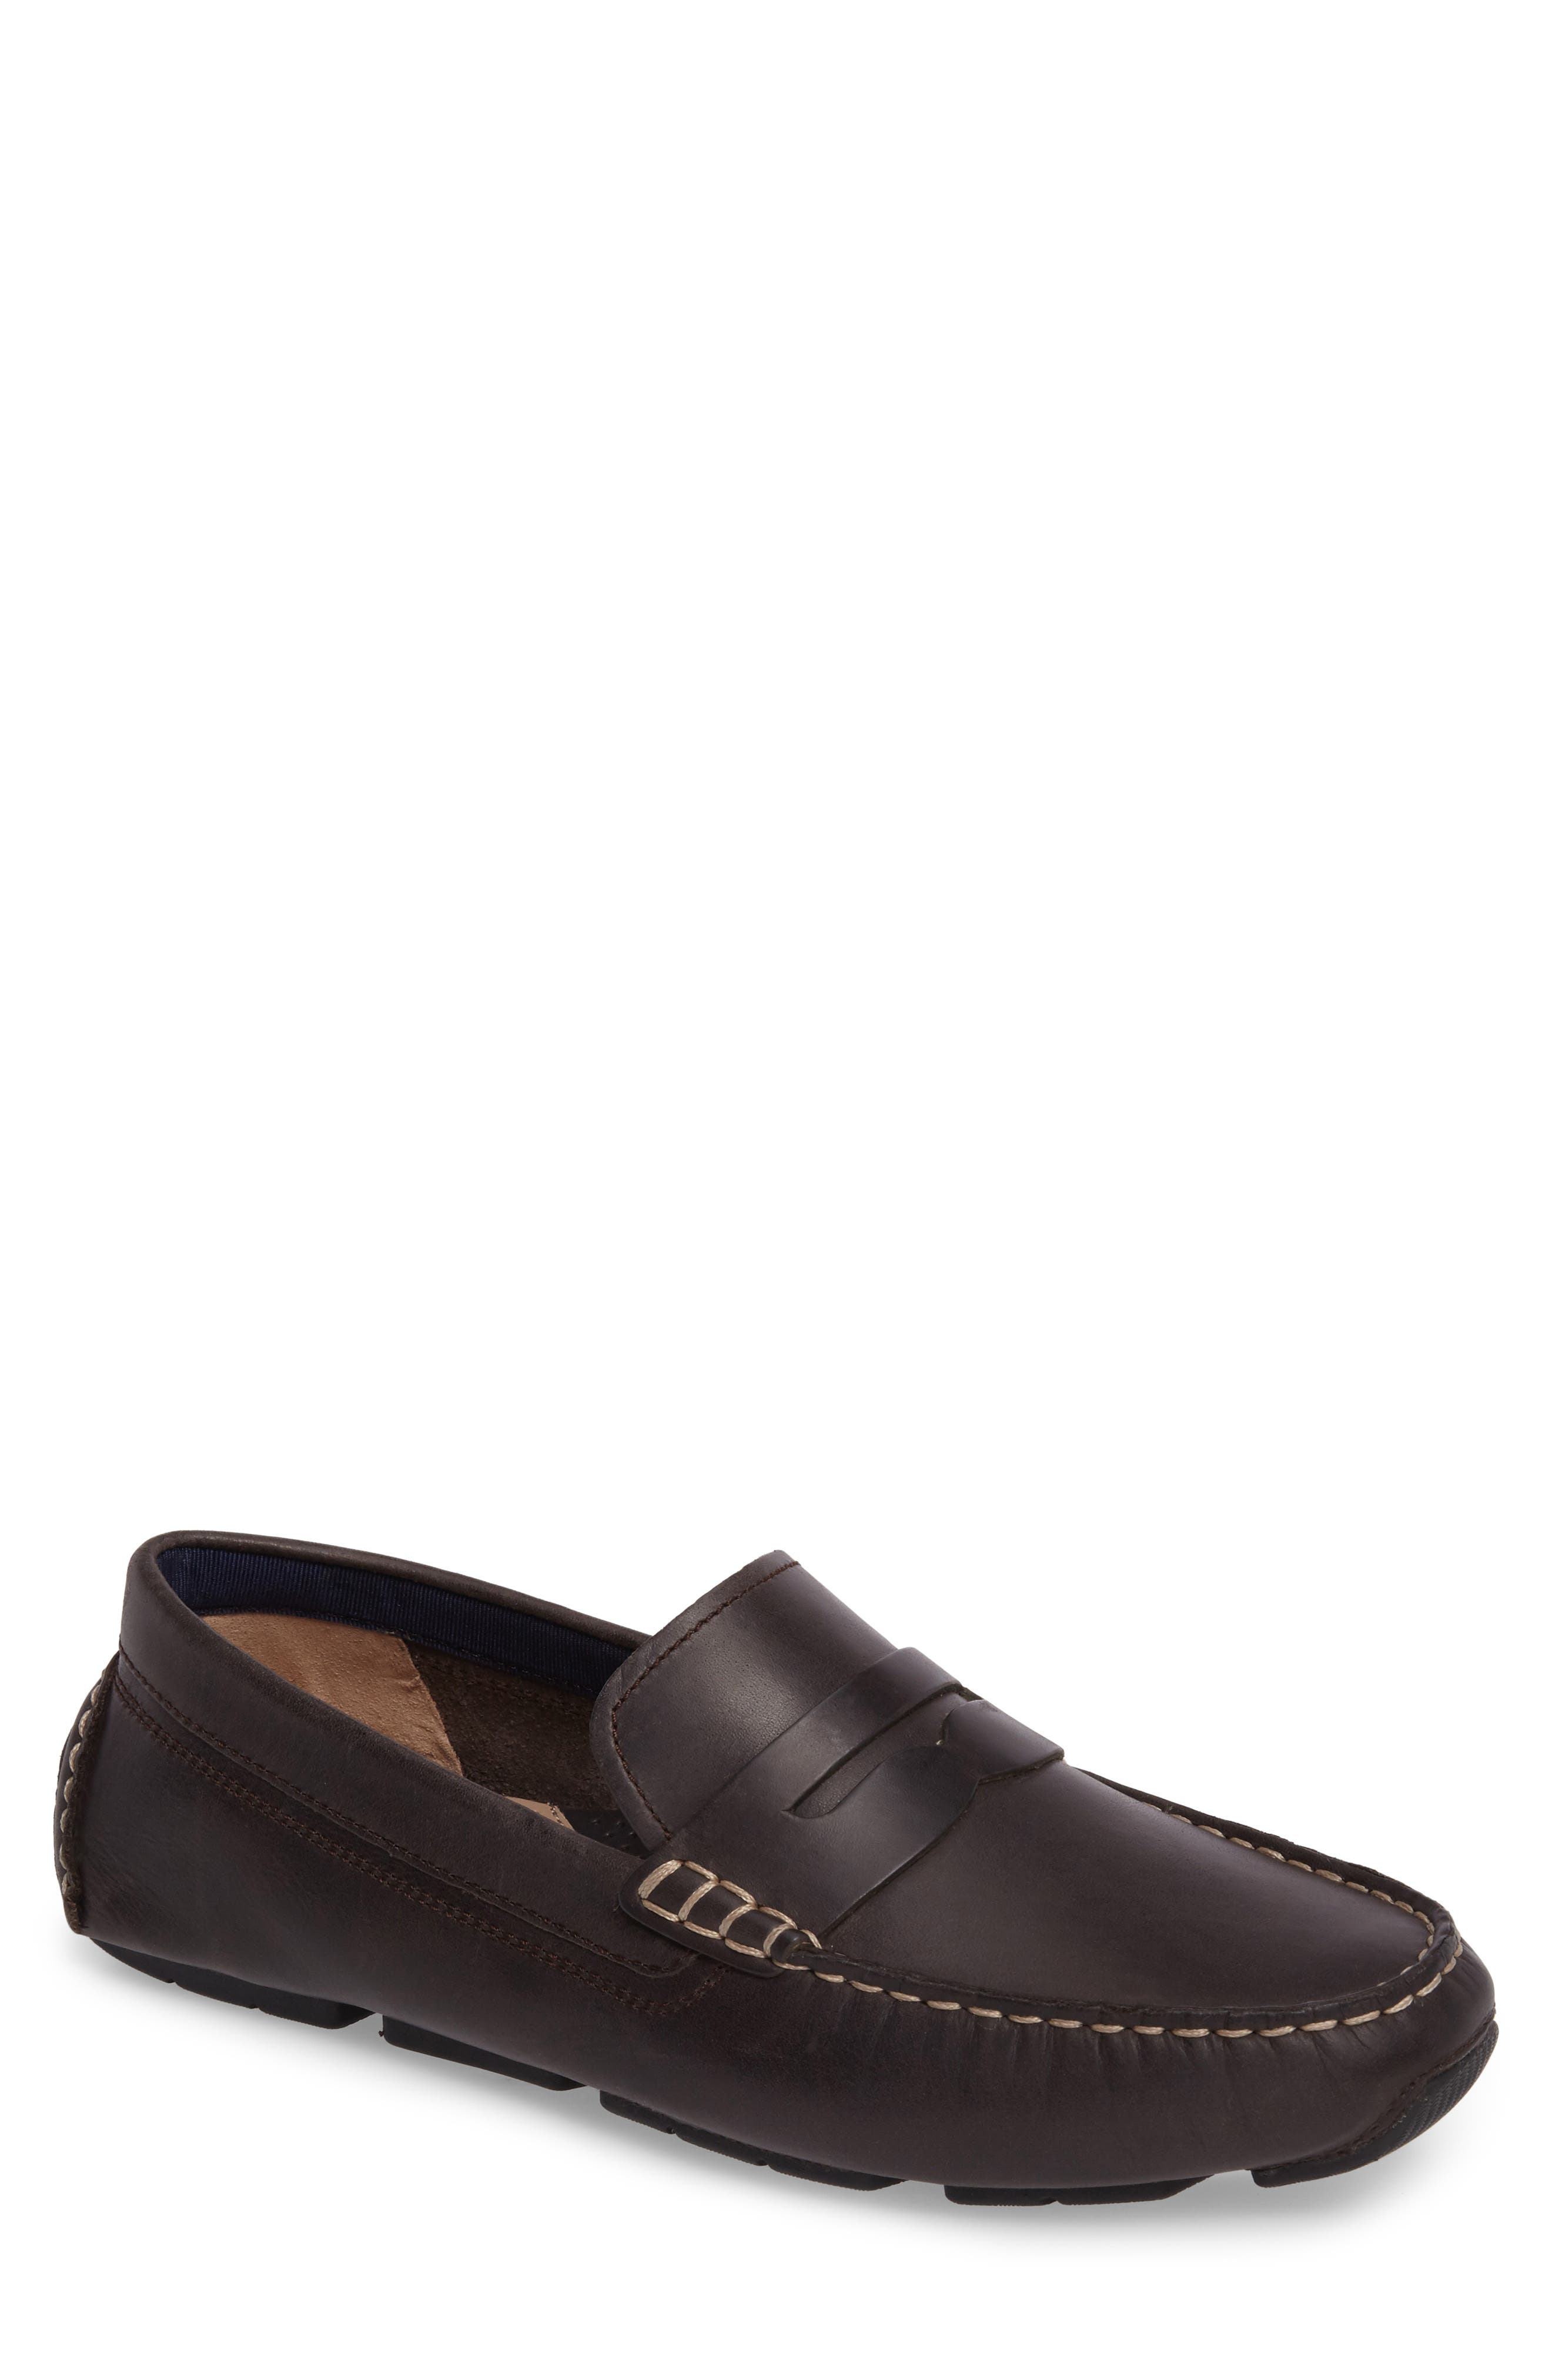 Kelson Driving Shoe,                         Main,                         color, 205